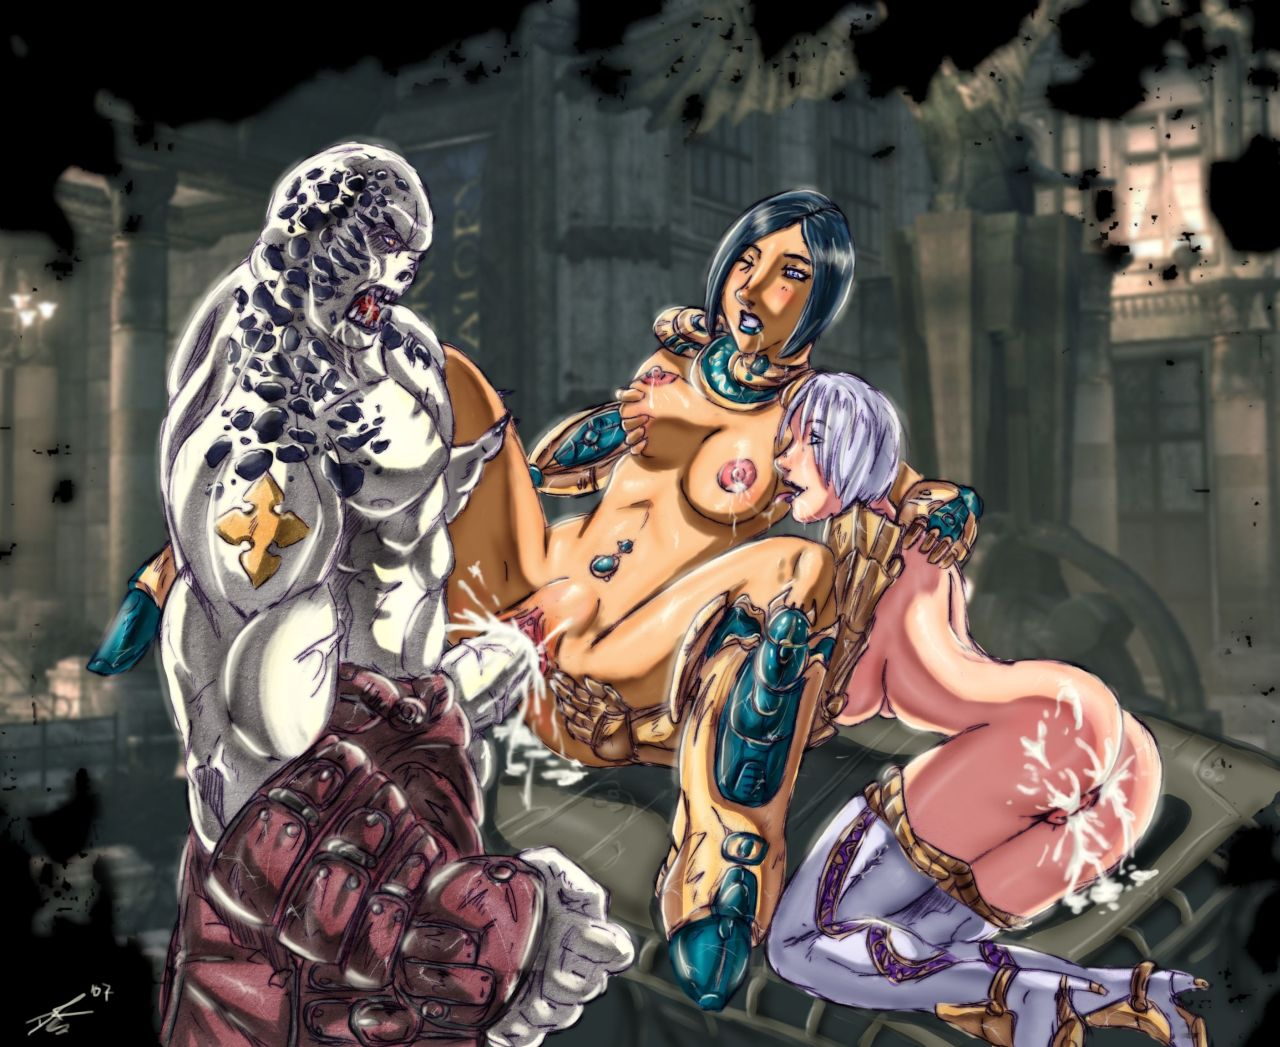 war sam gears naked of Final fantasy brave exvius dark fina